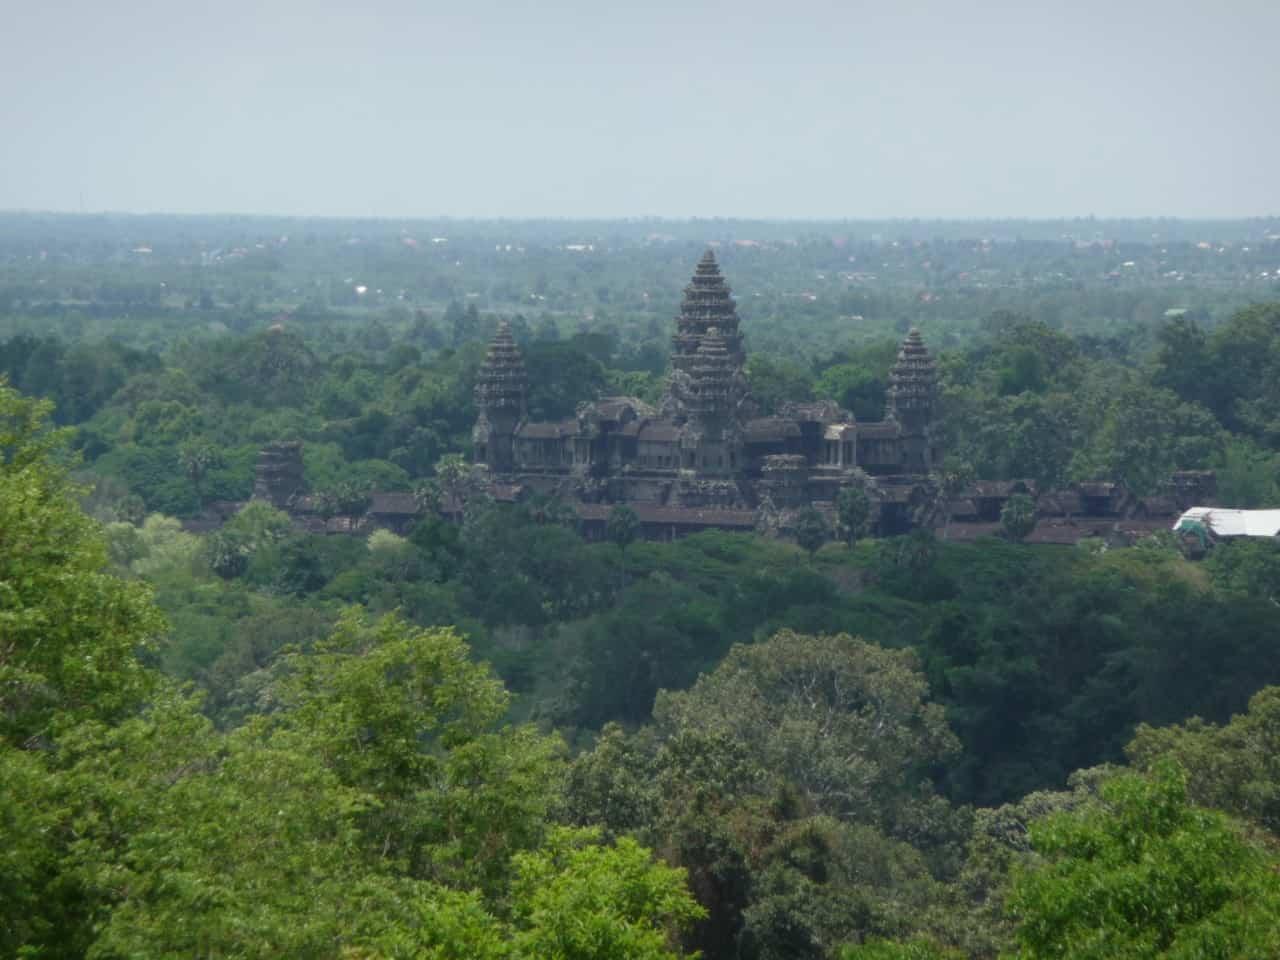 Kambodscha - Angkor - Blick auf Angkor Wat von Phnom Bakheng